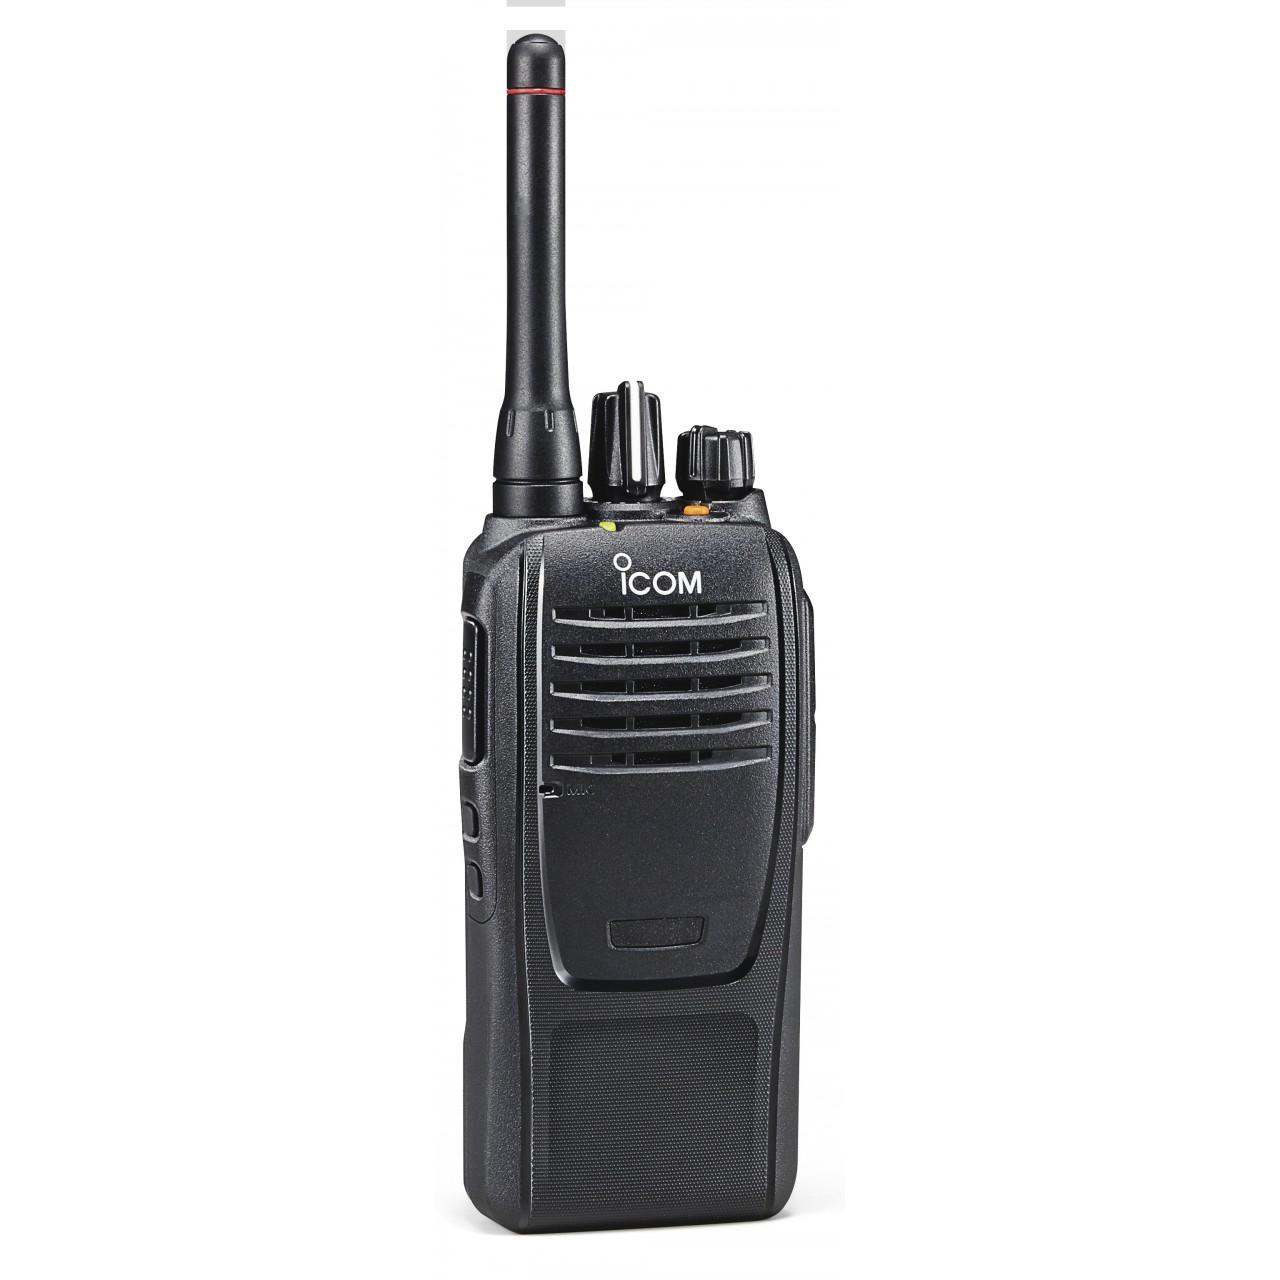 IC-F2000 Handhelds - ICOM